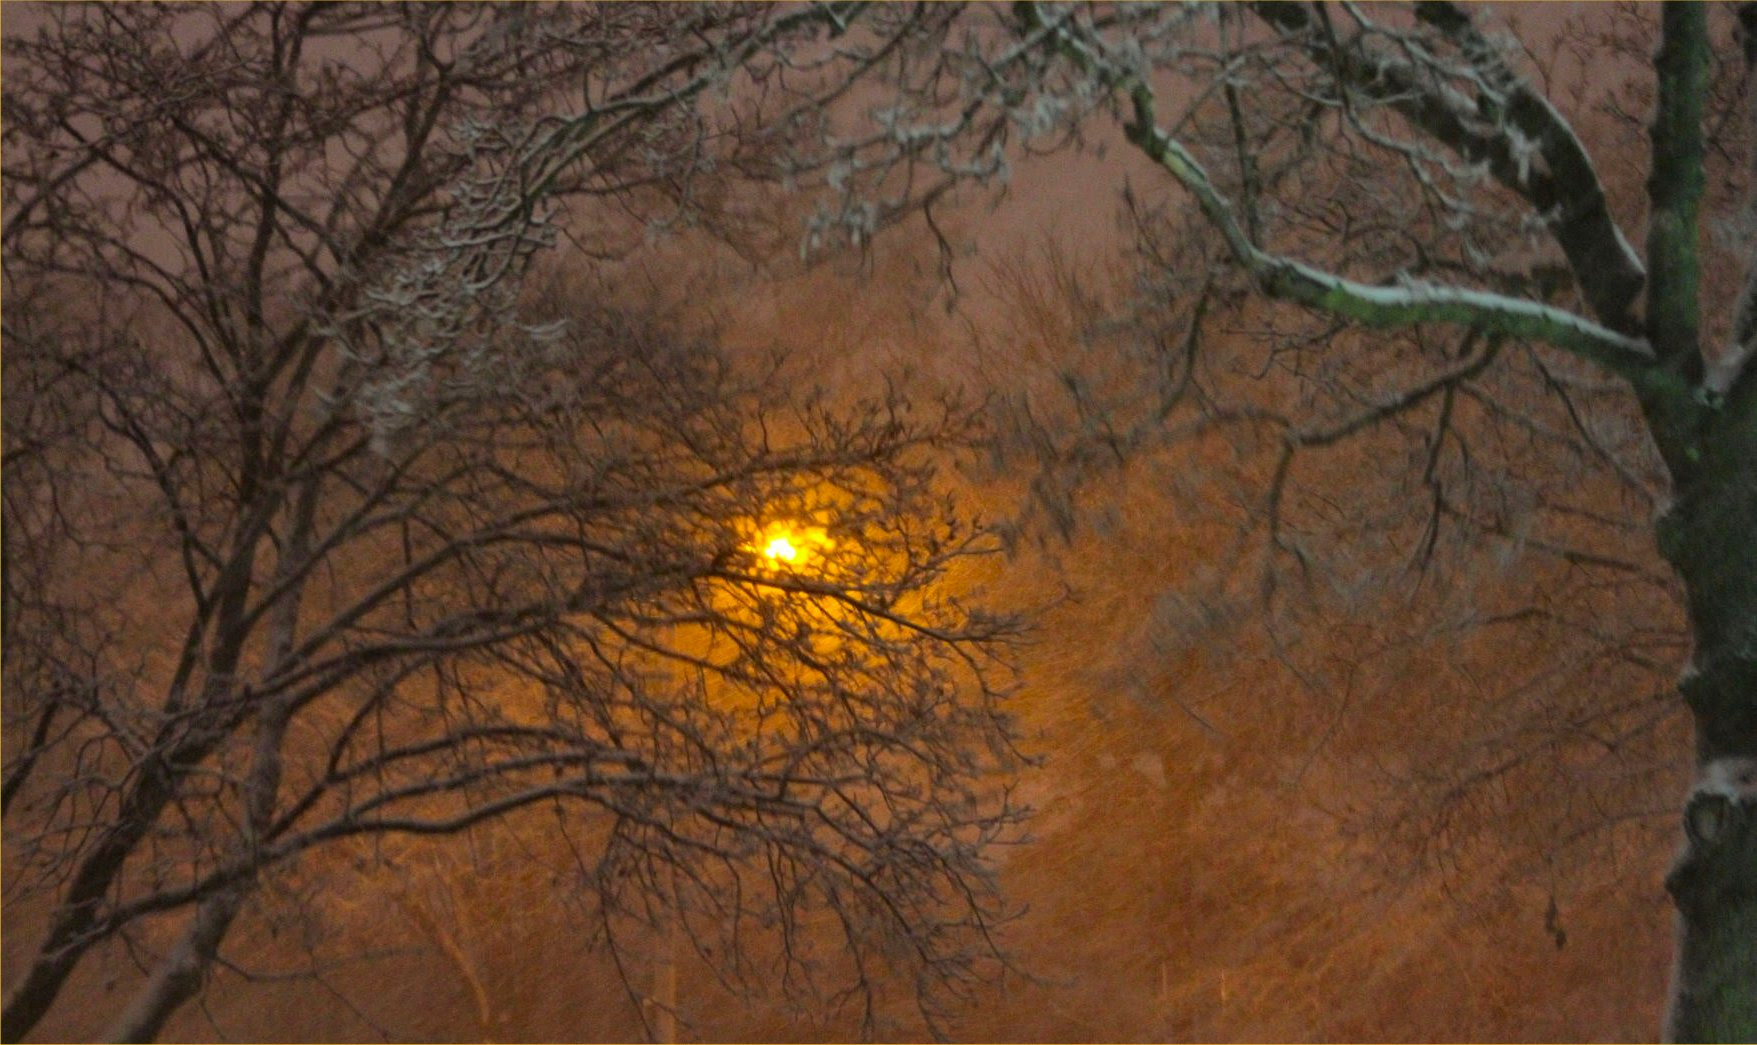 Wiconsin December 2009 Street Light and Trees Photo - soul-amp.com